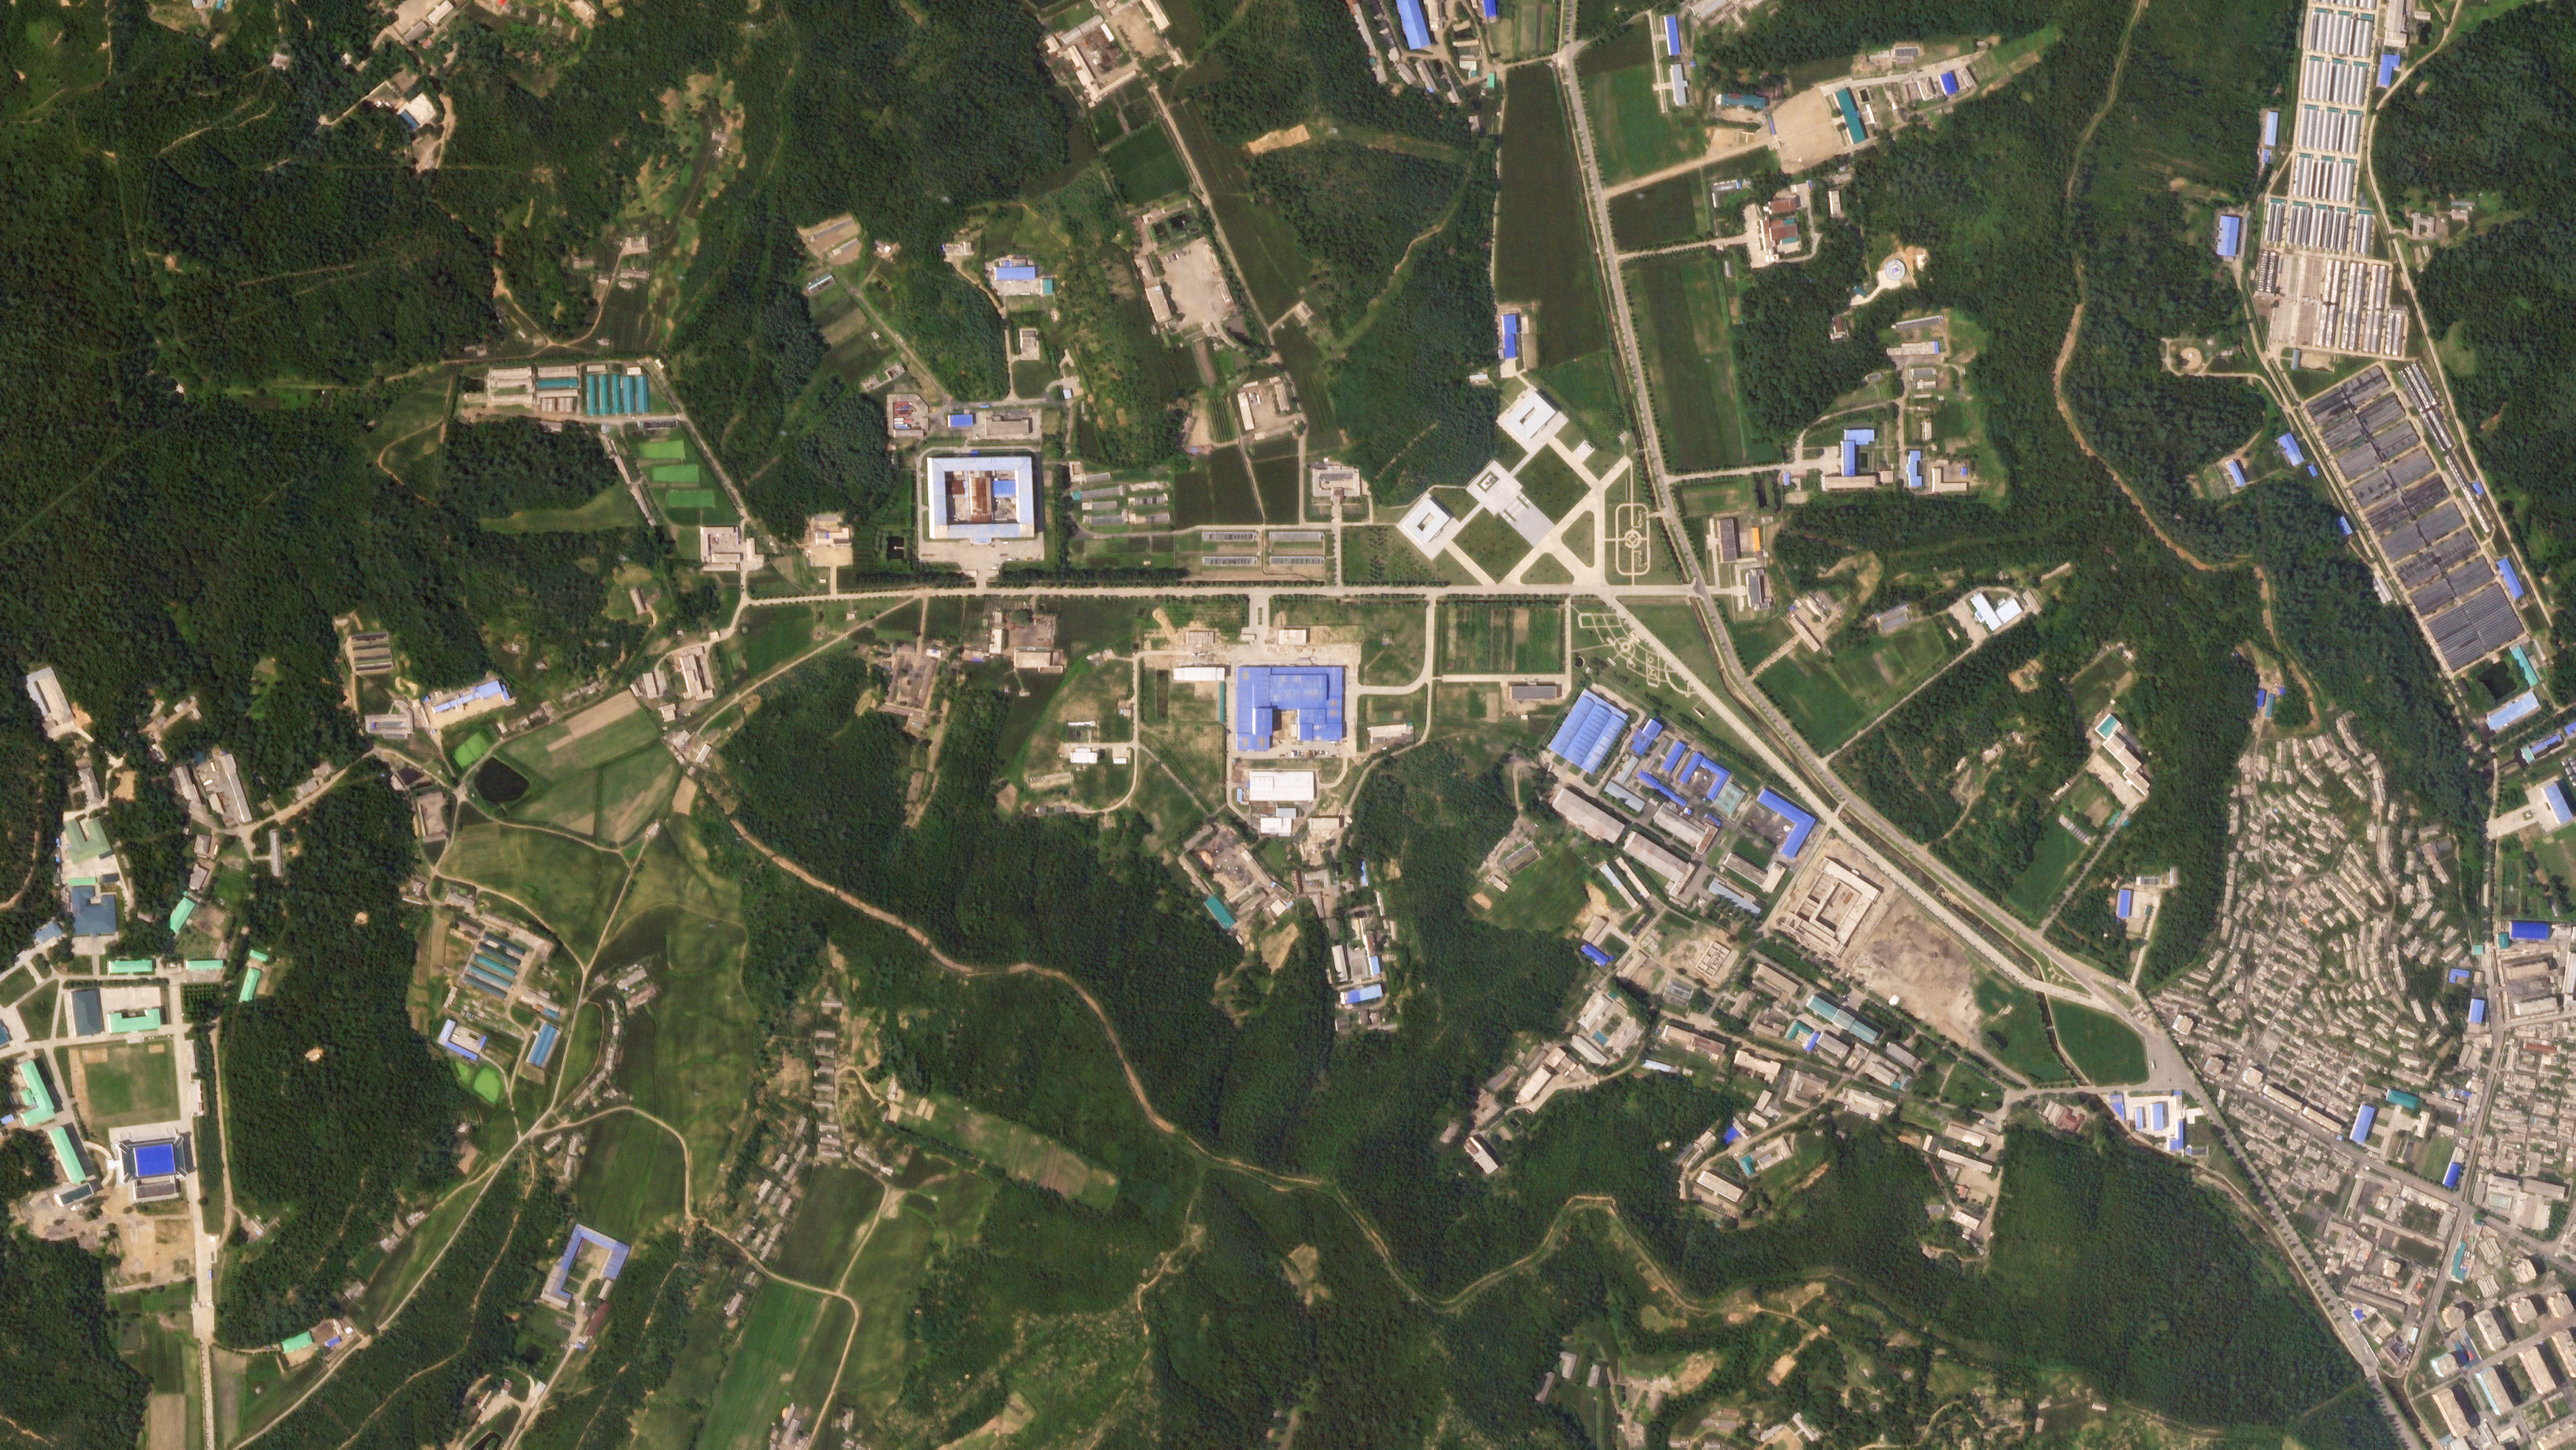 satellite image - Sanumdong missile production site, North Korea